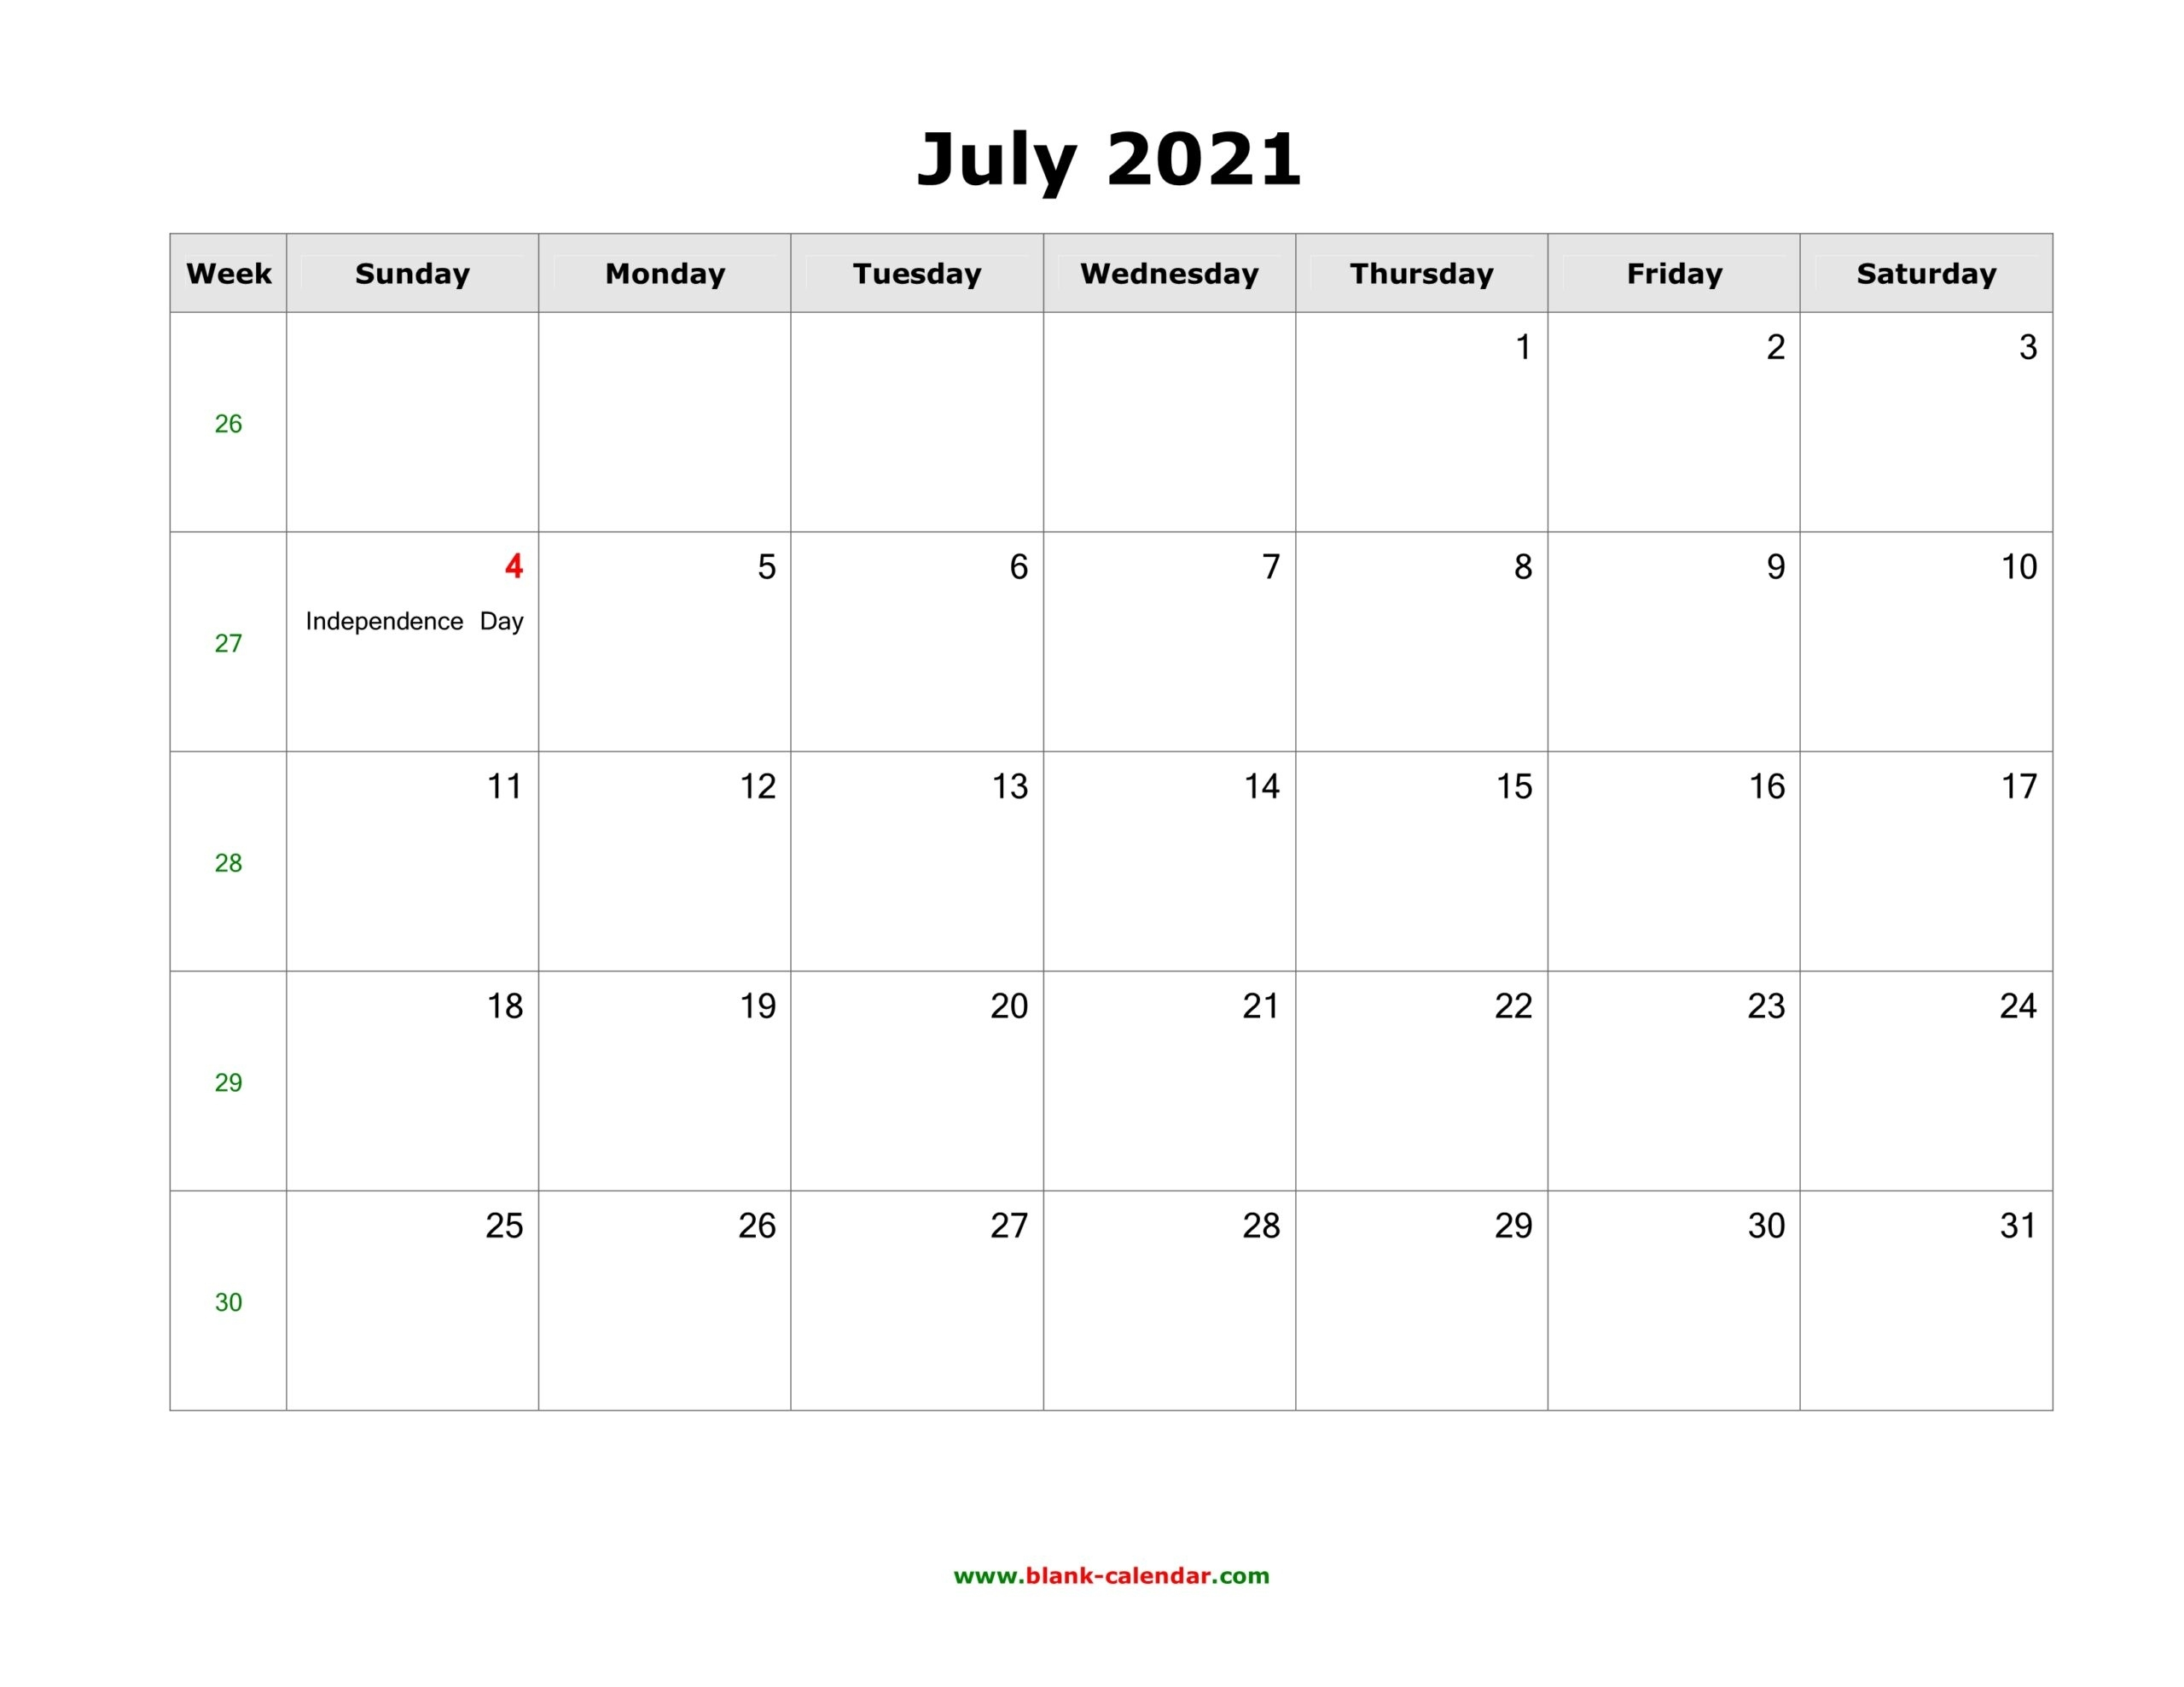 June 2021 Printable Calendar In Pdf, Word, Excel - Calendar End - 2020 Calendar Printable February March April May June 2021 Calendar